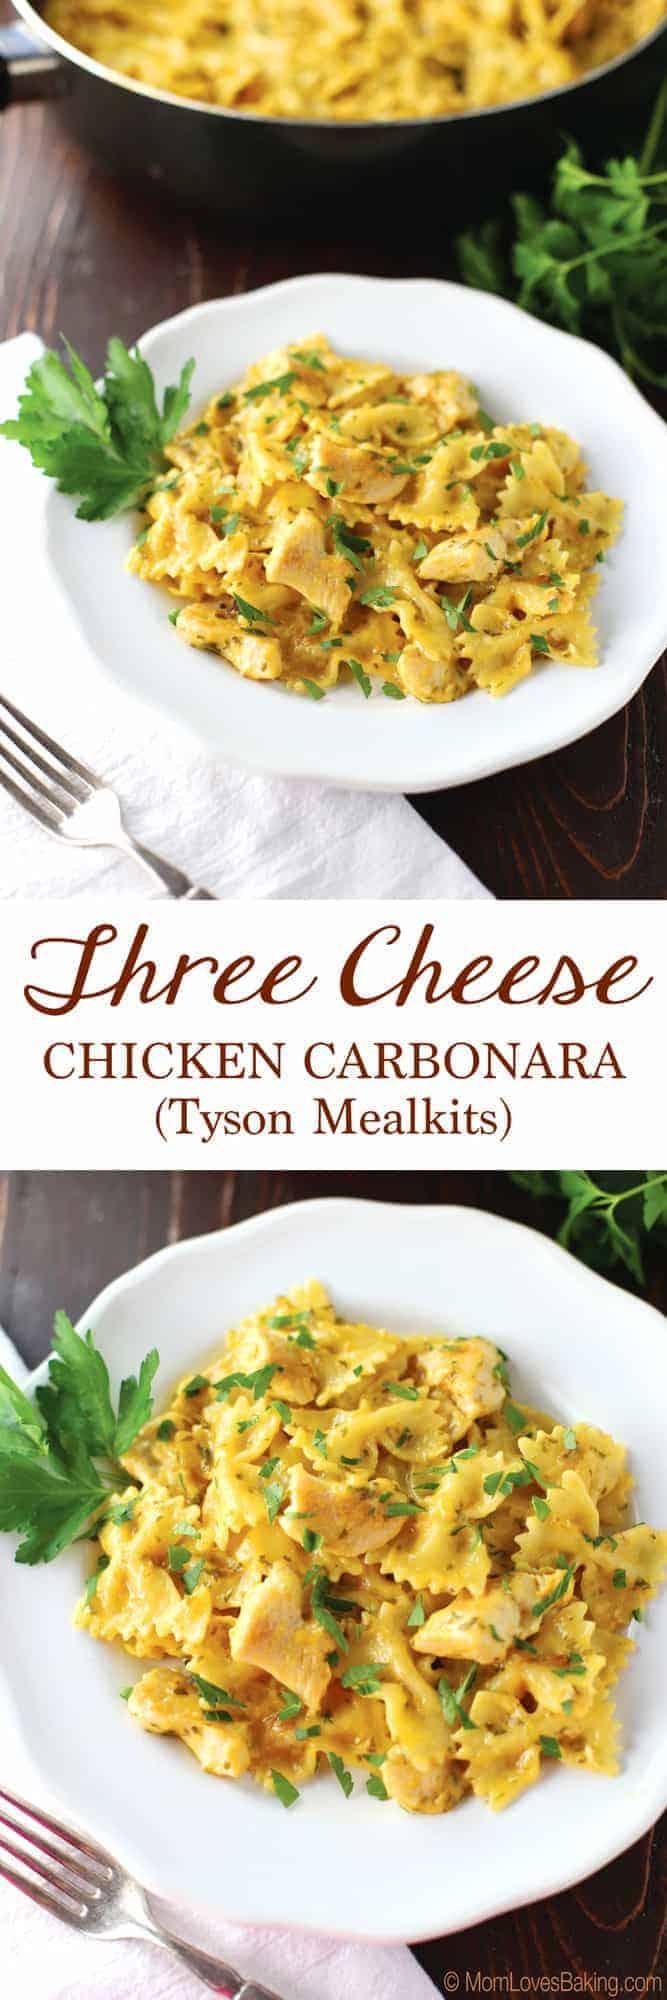 Three Cheese Chicken Carbonara